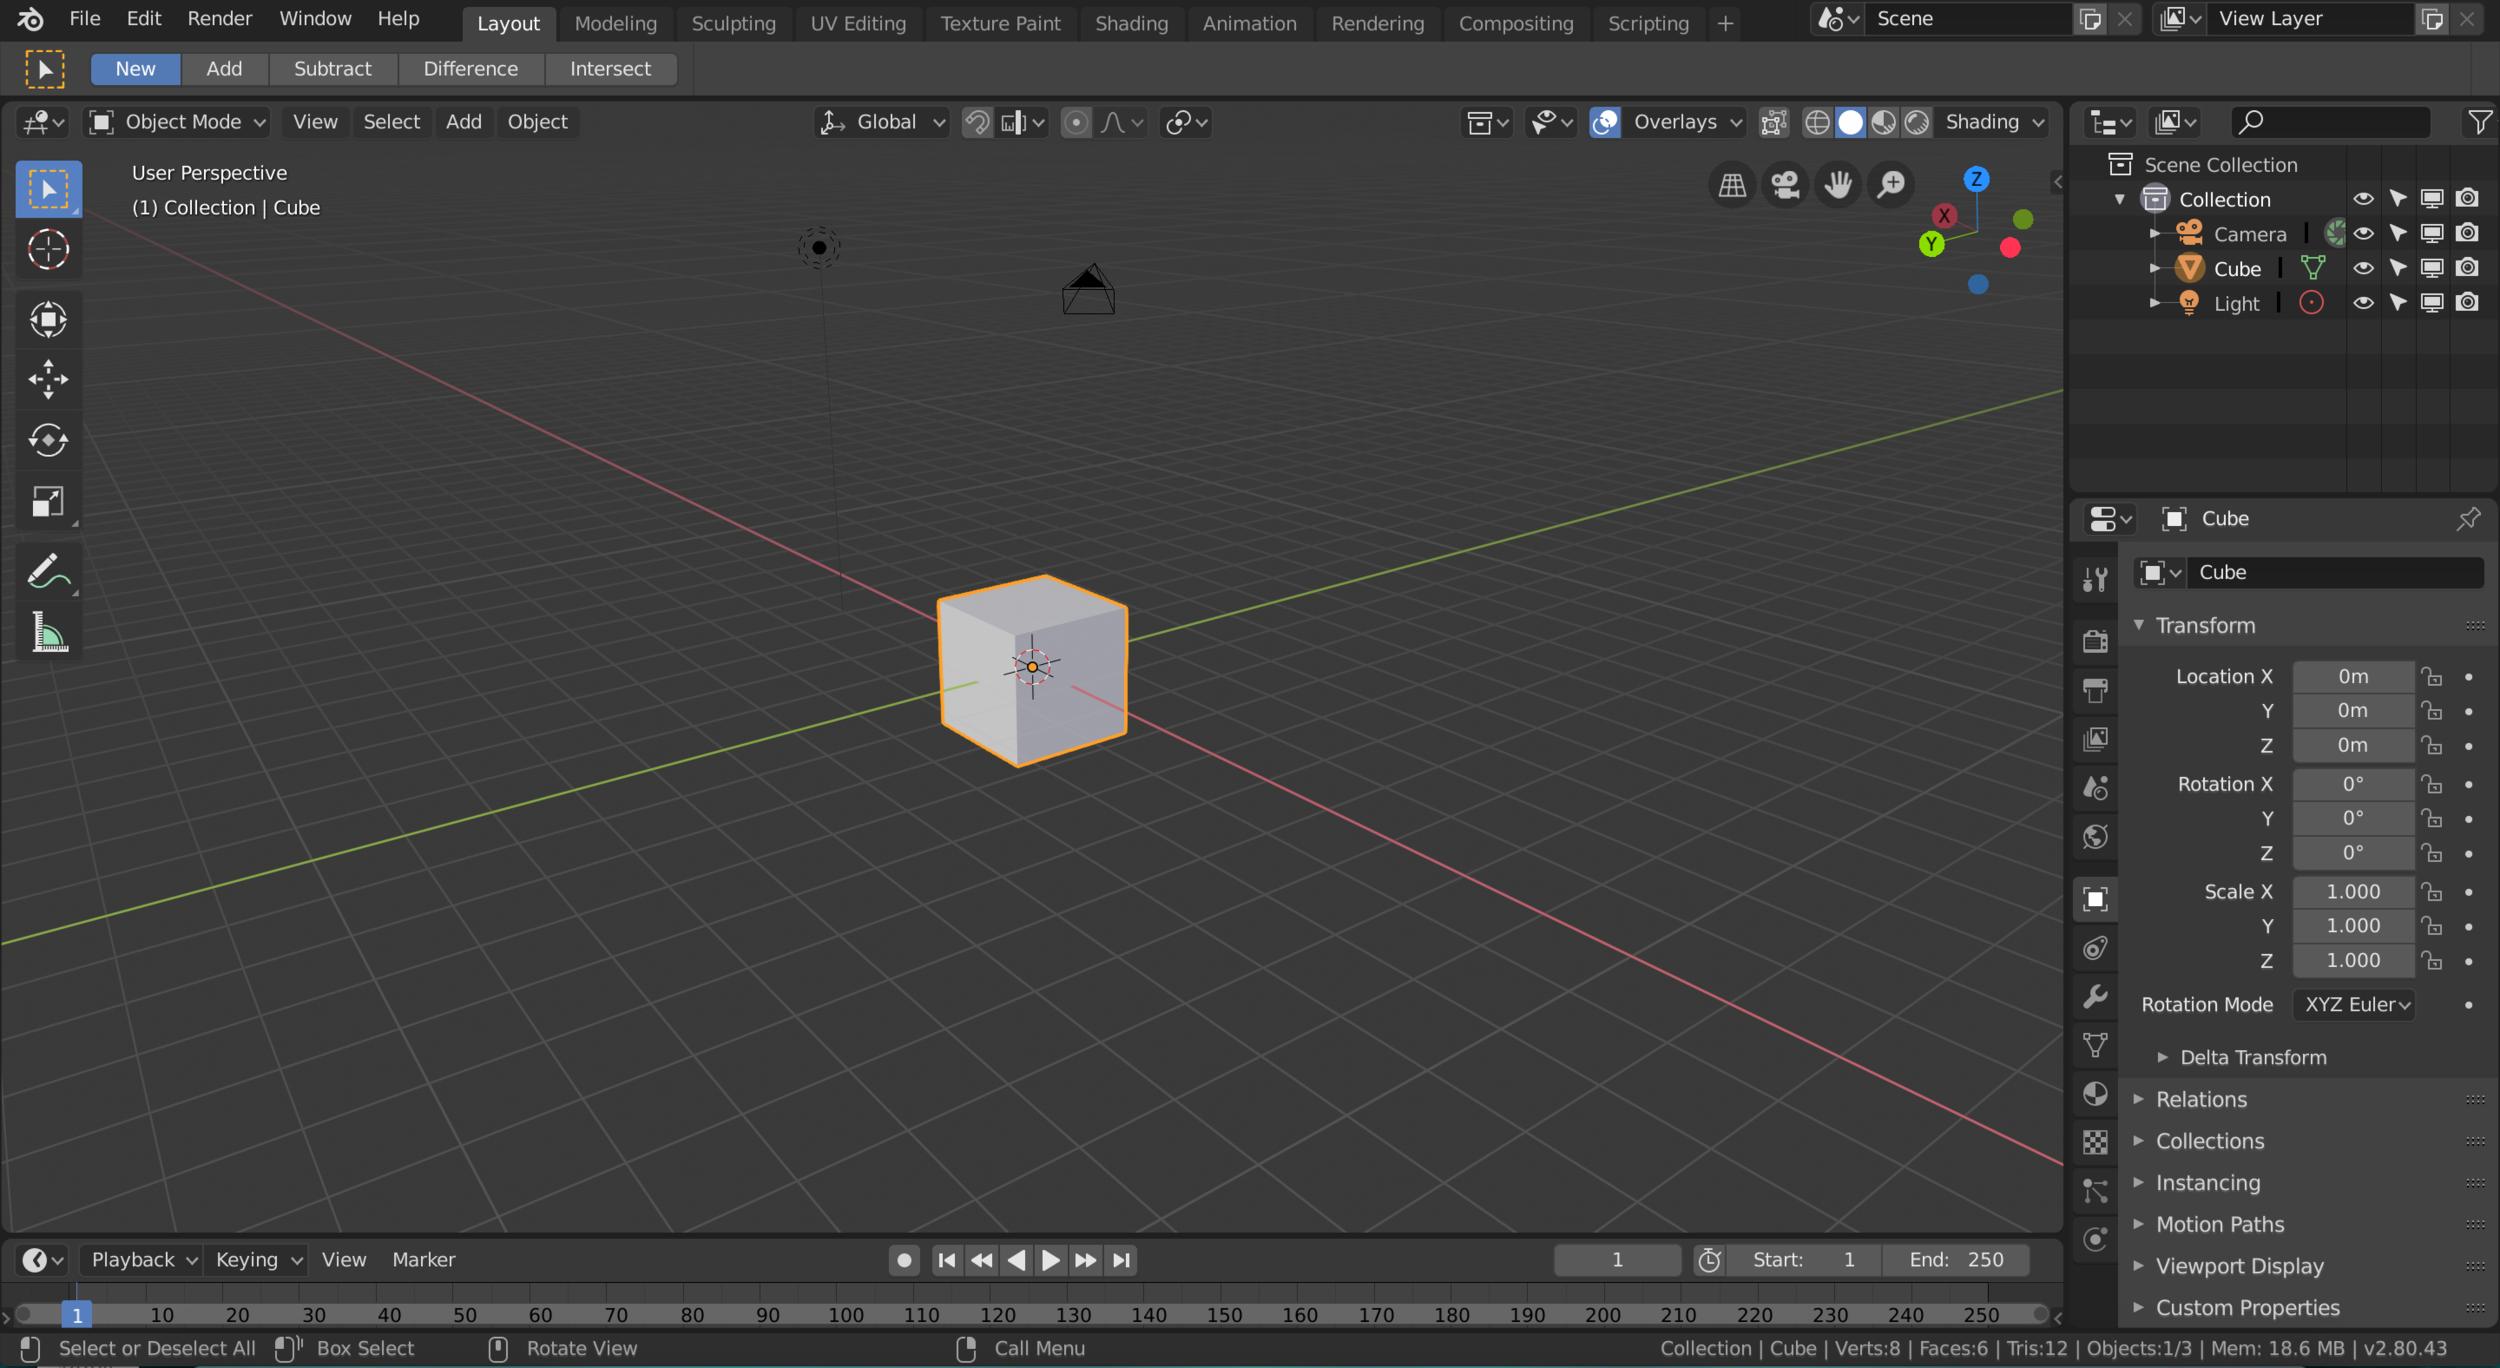 Screenshot of Blender 2.80